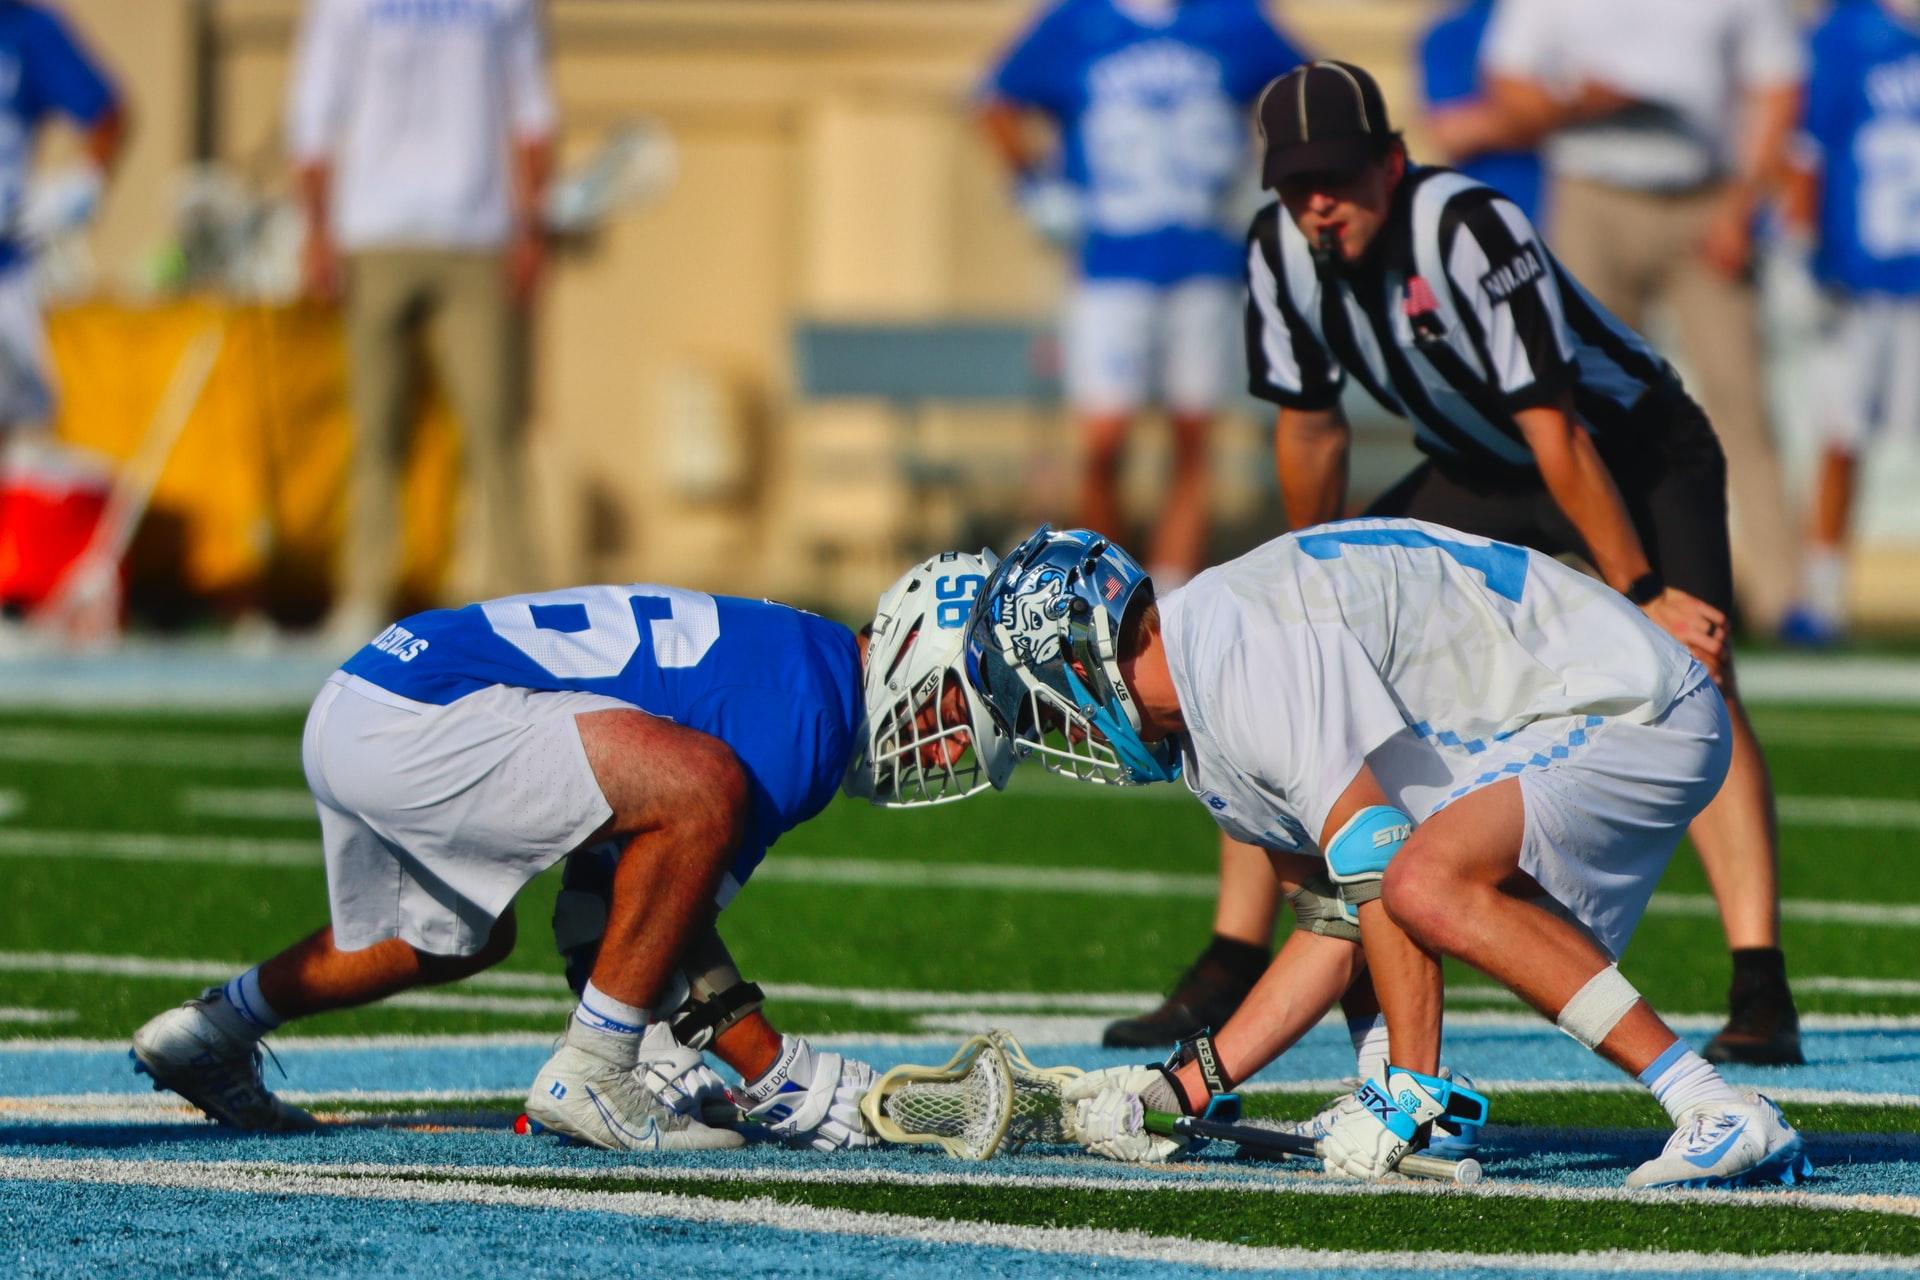 men's lacrosse game